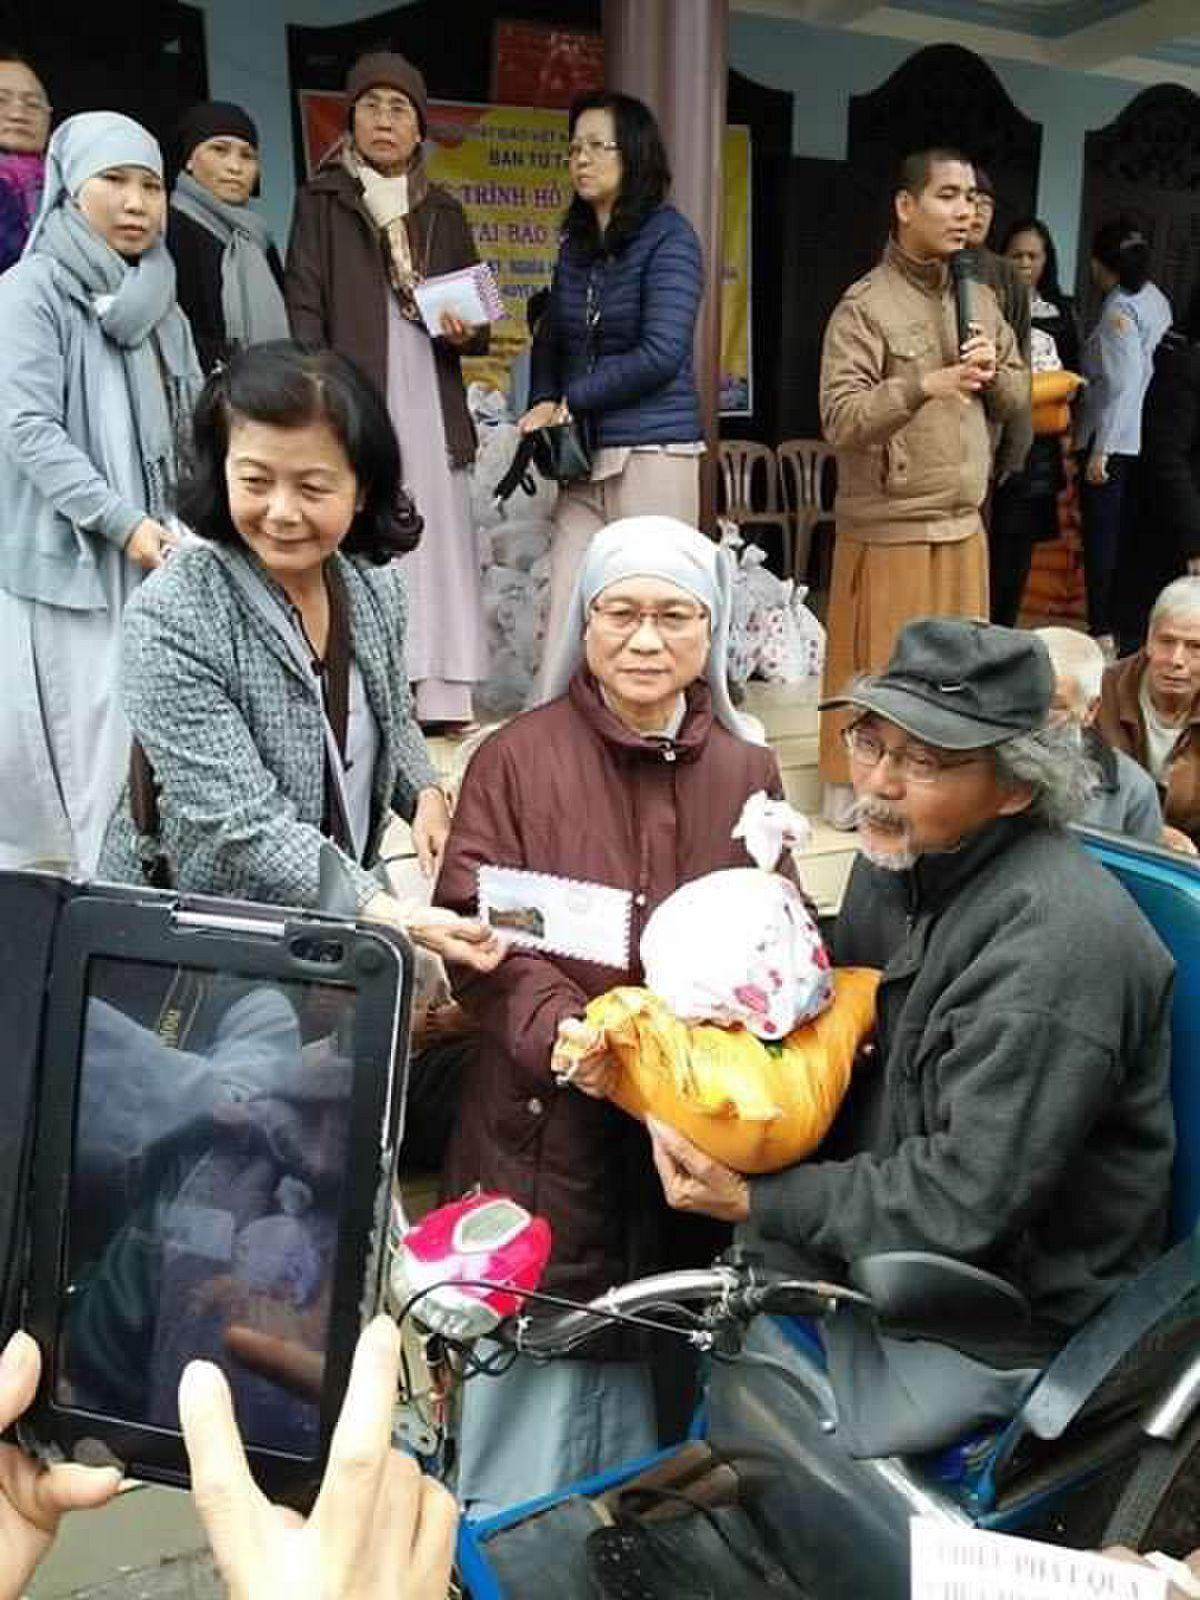 tang qua Quang ngai 2 (46)